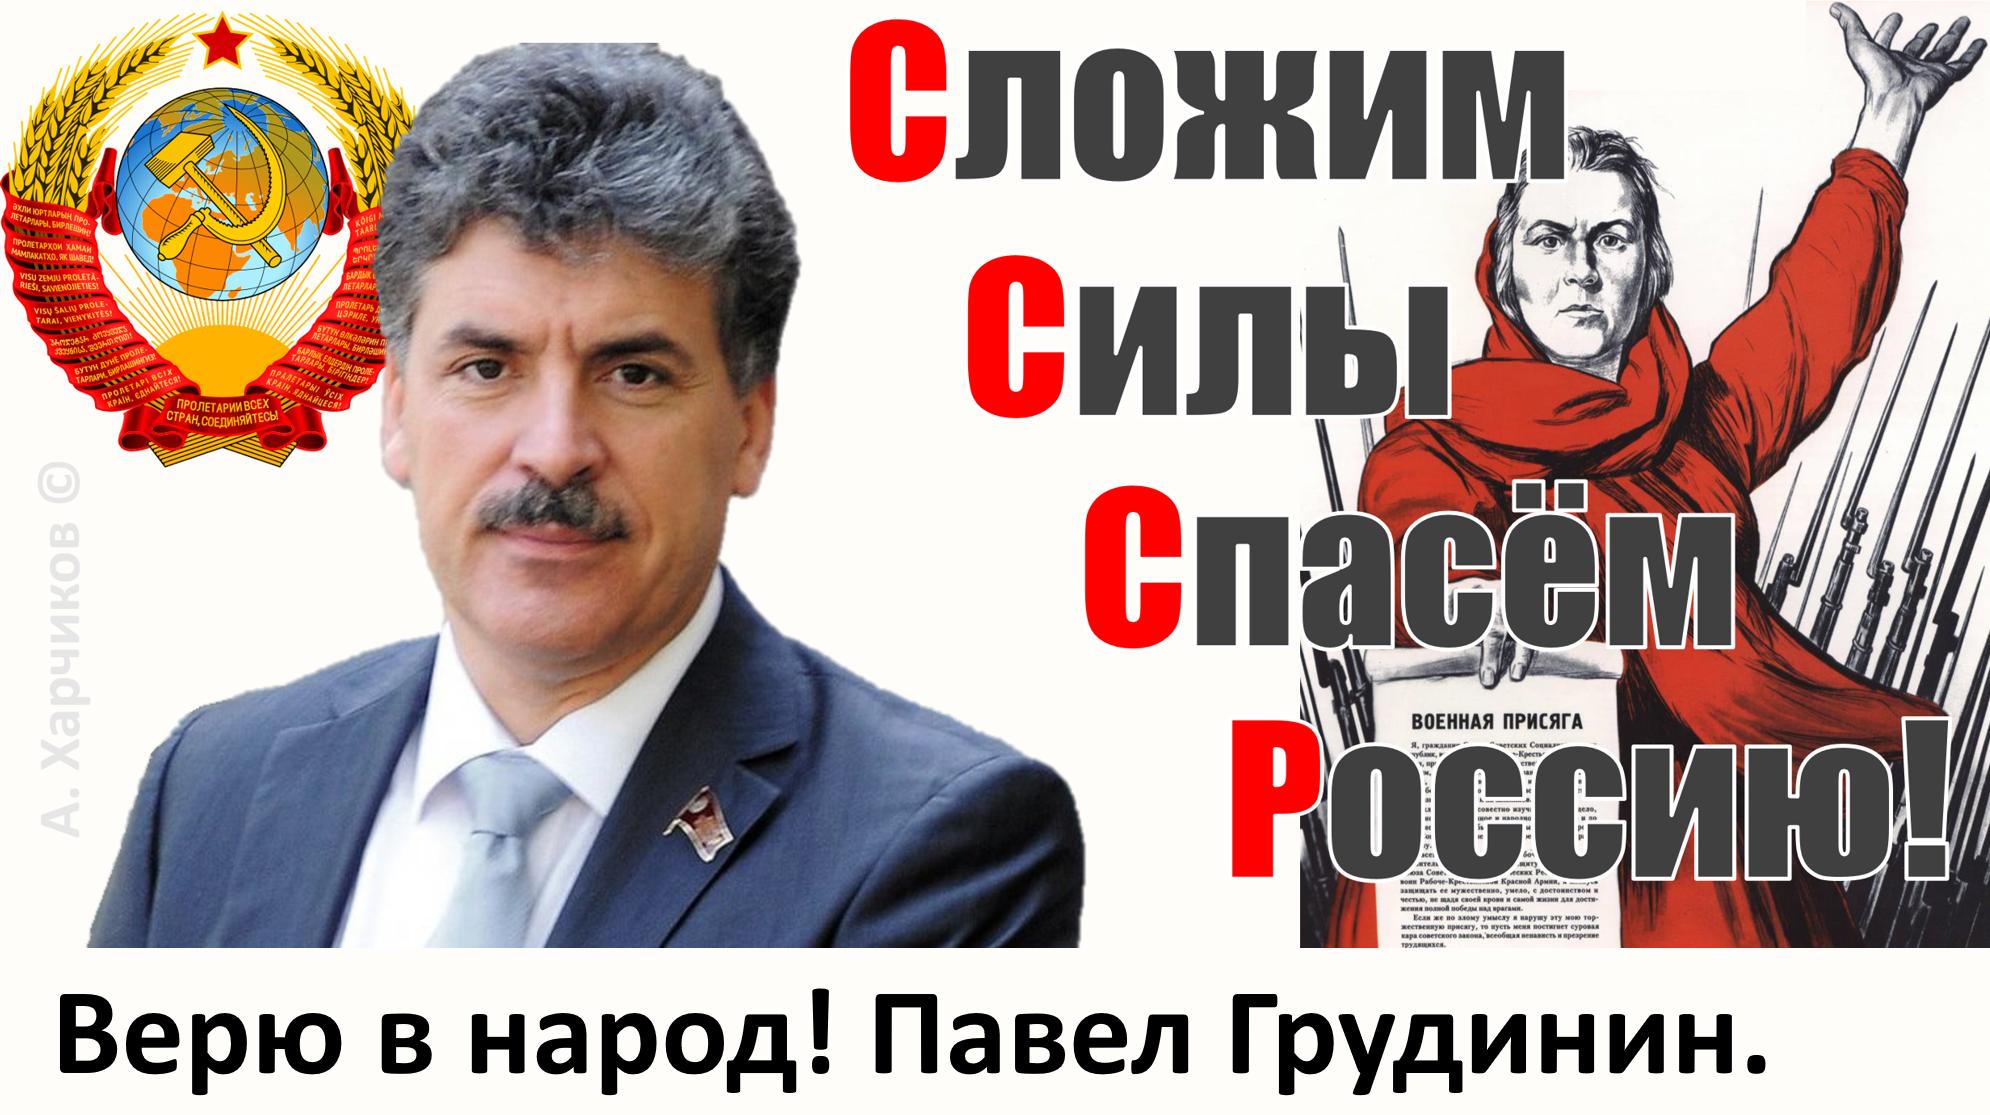 https://images.vfl.ru/ii/1520930293/ac9ccc1e/20937542.png